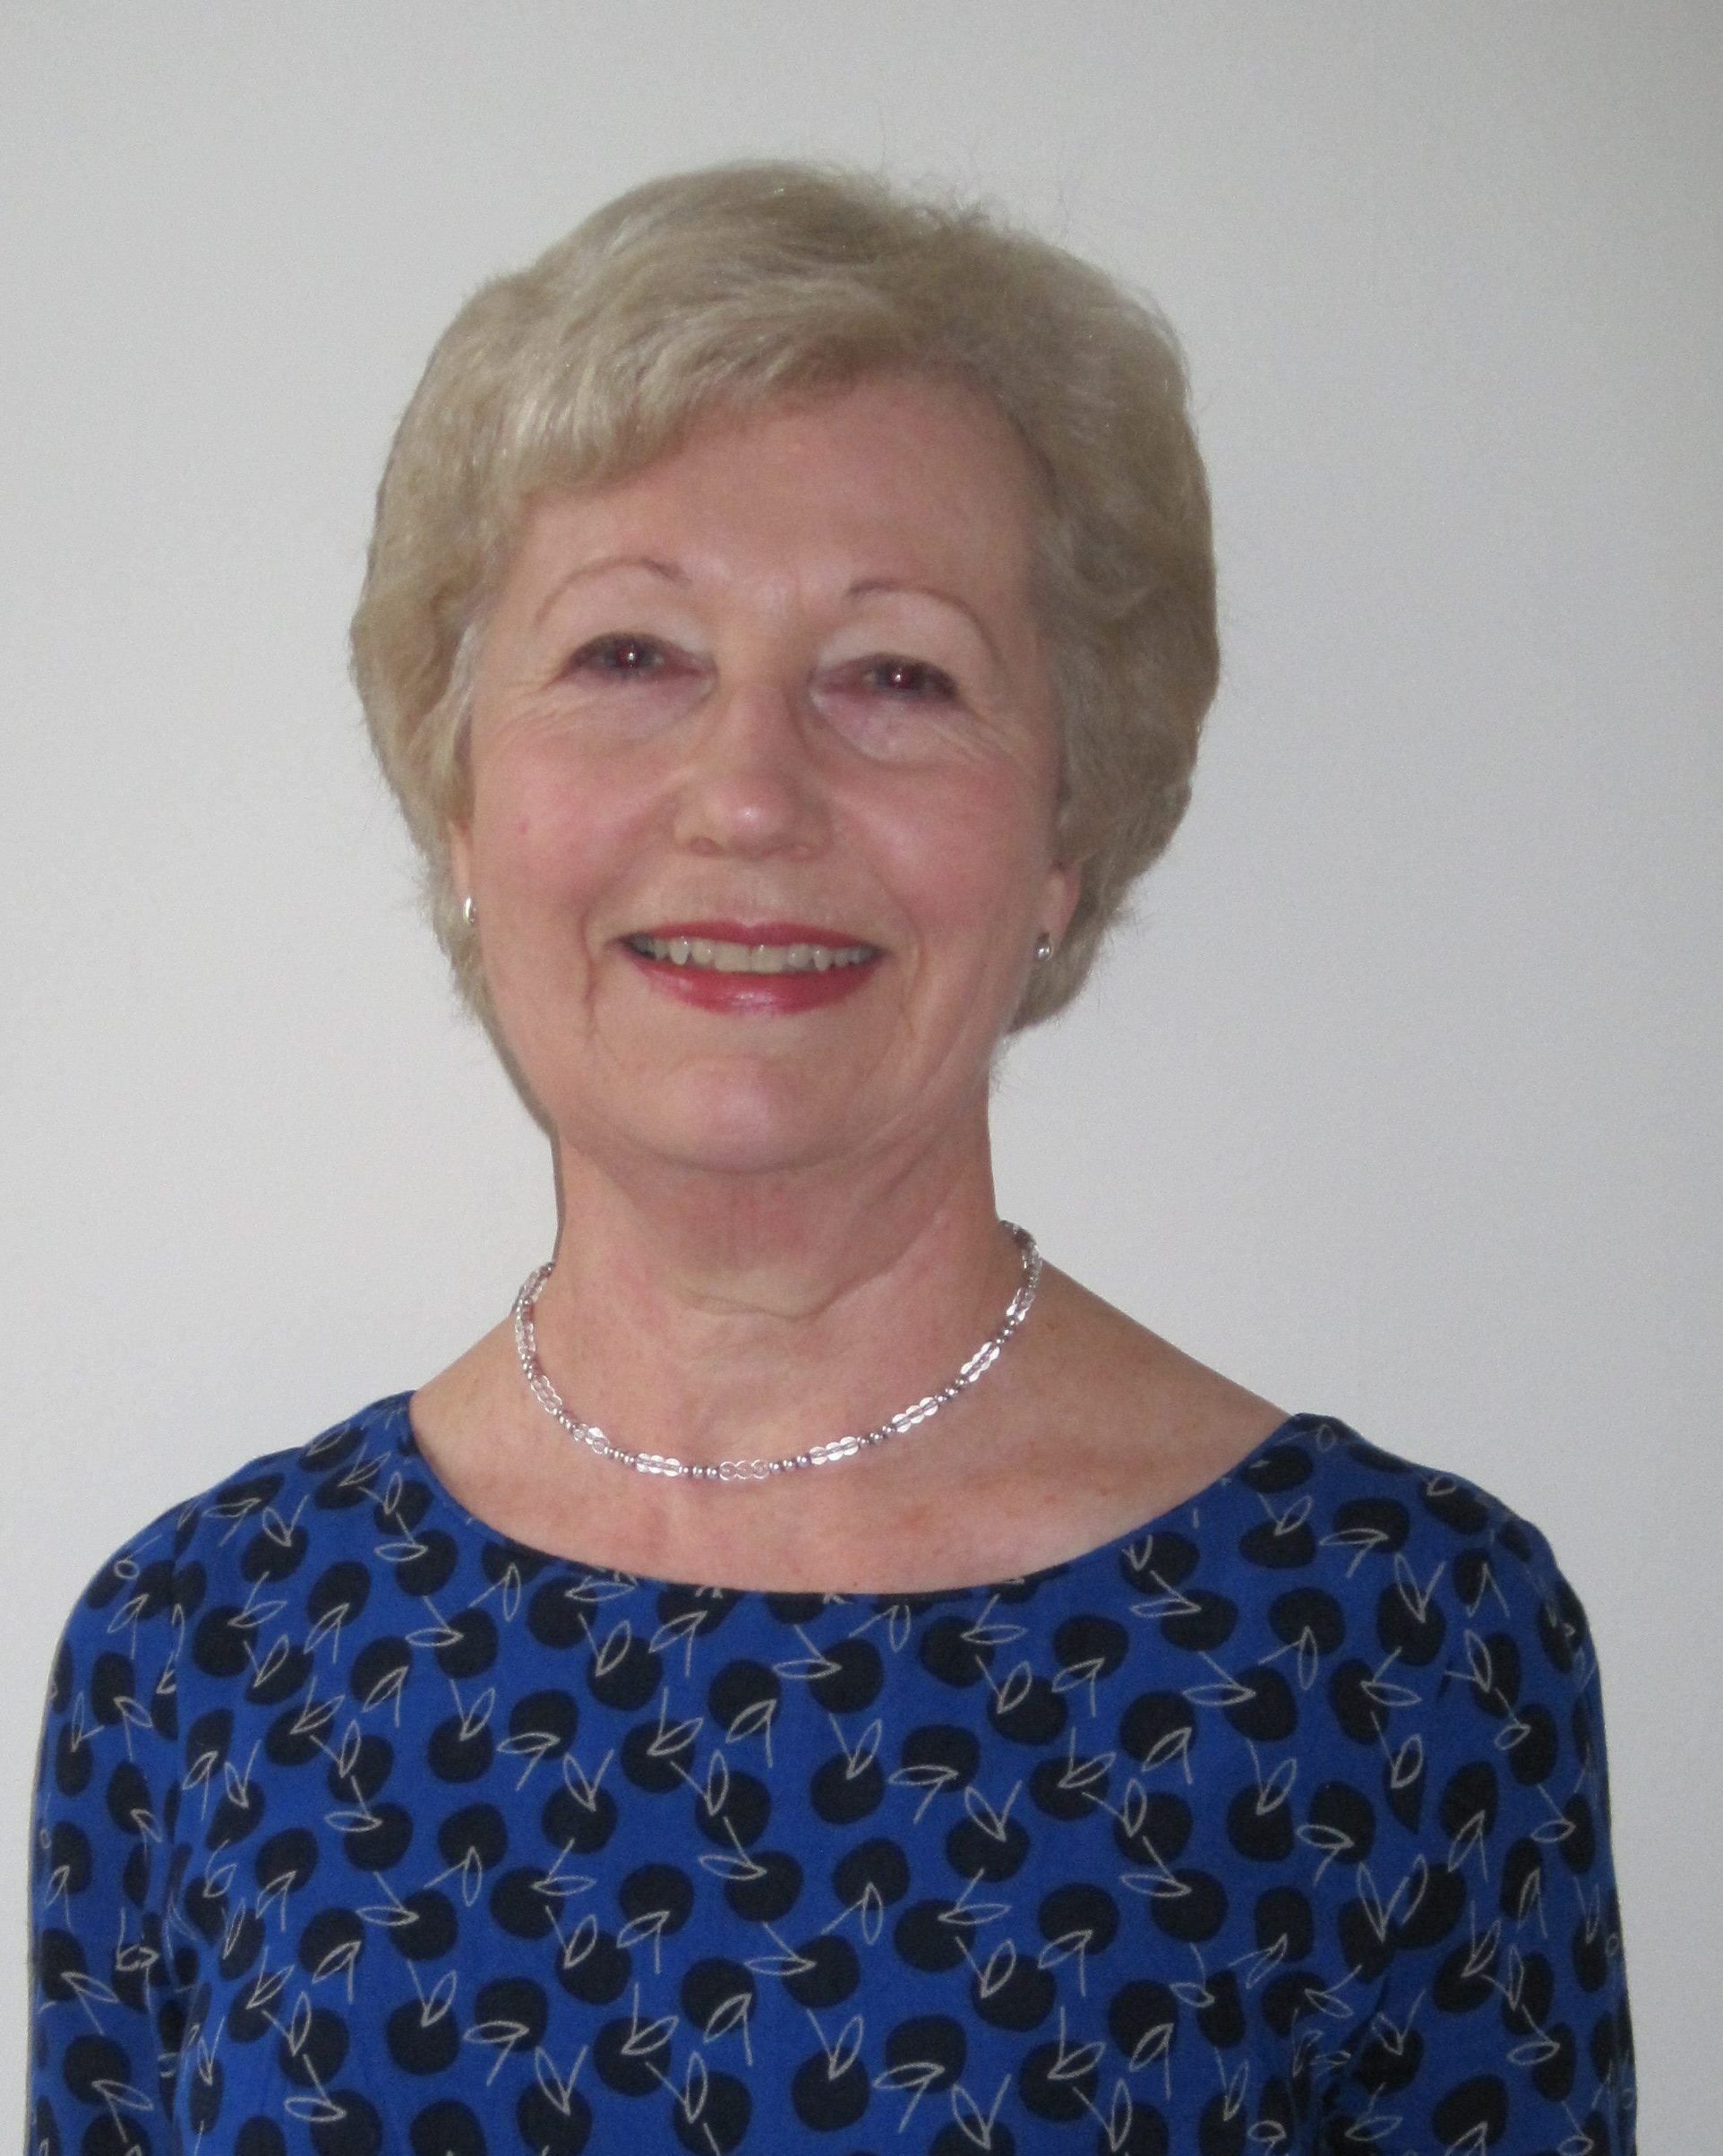 Sheilagh Baker